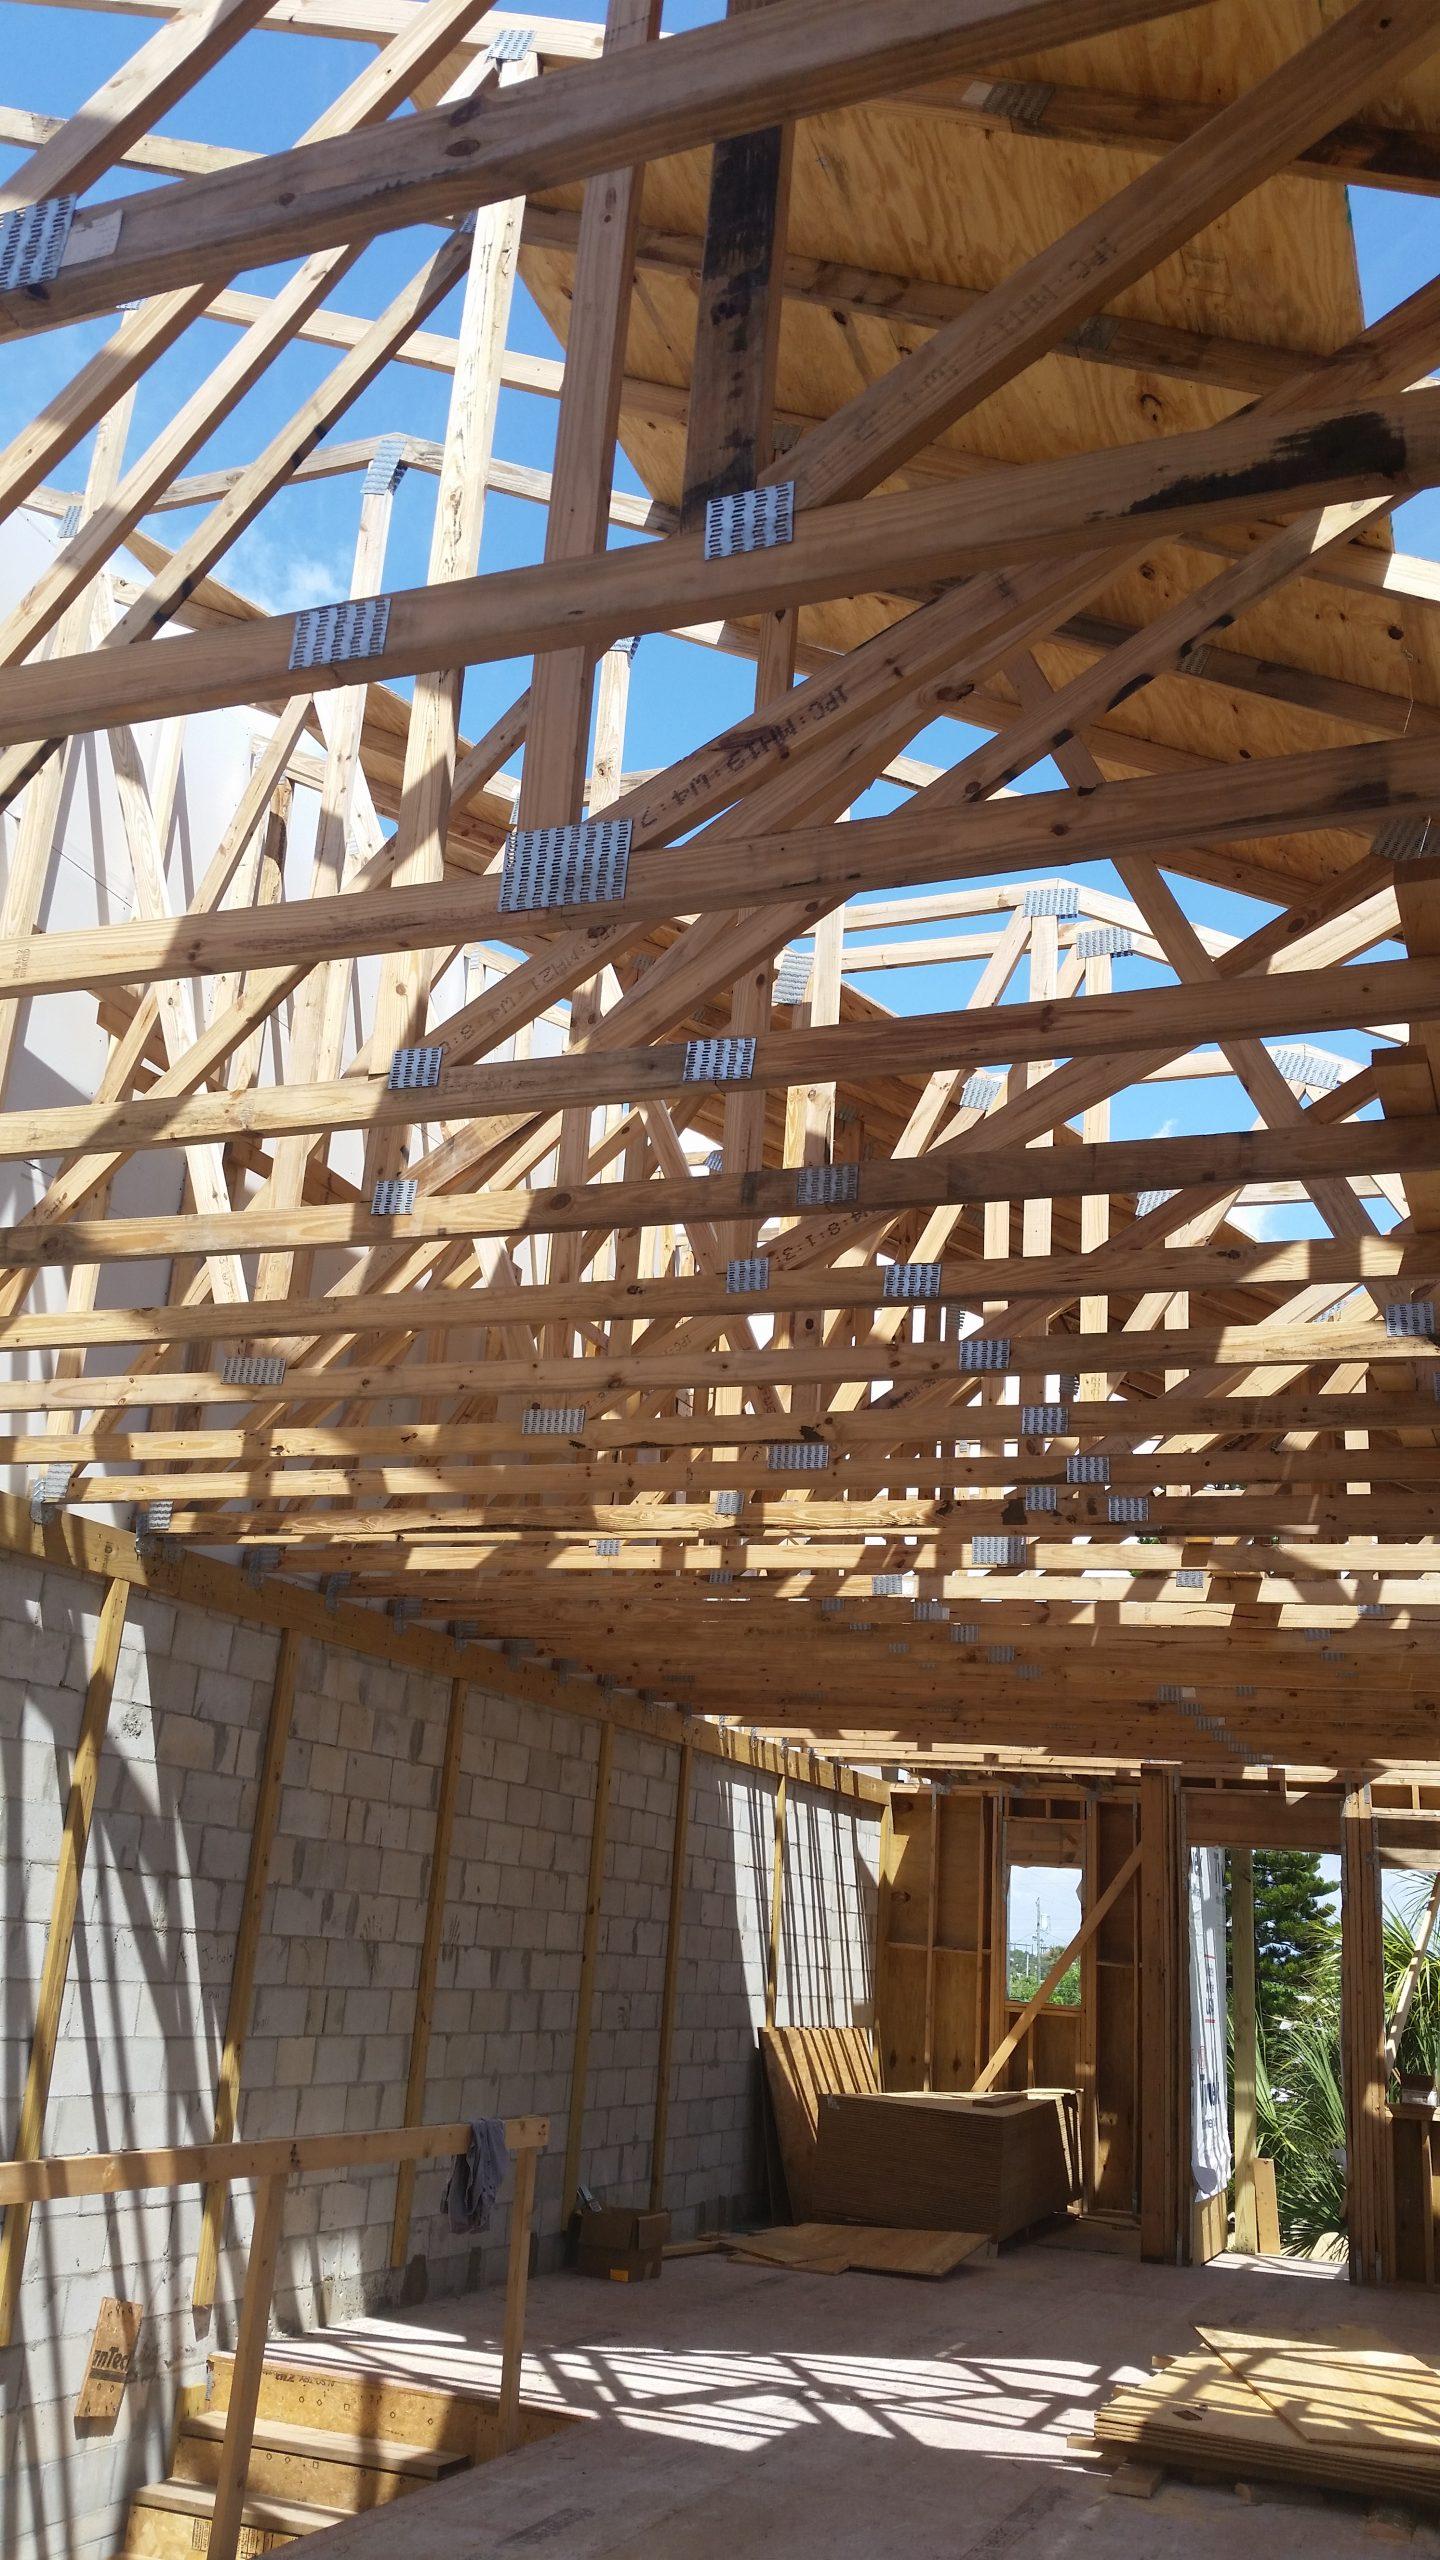 7-roof sheath start